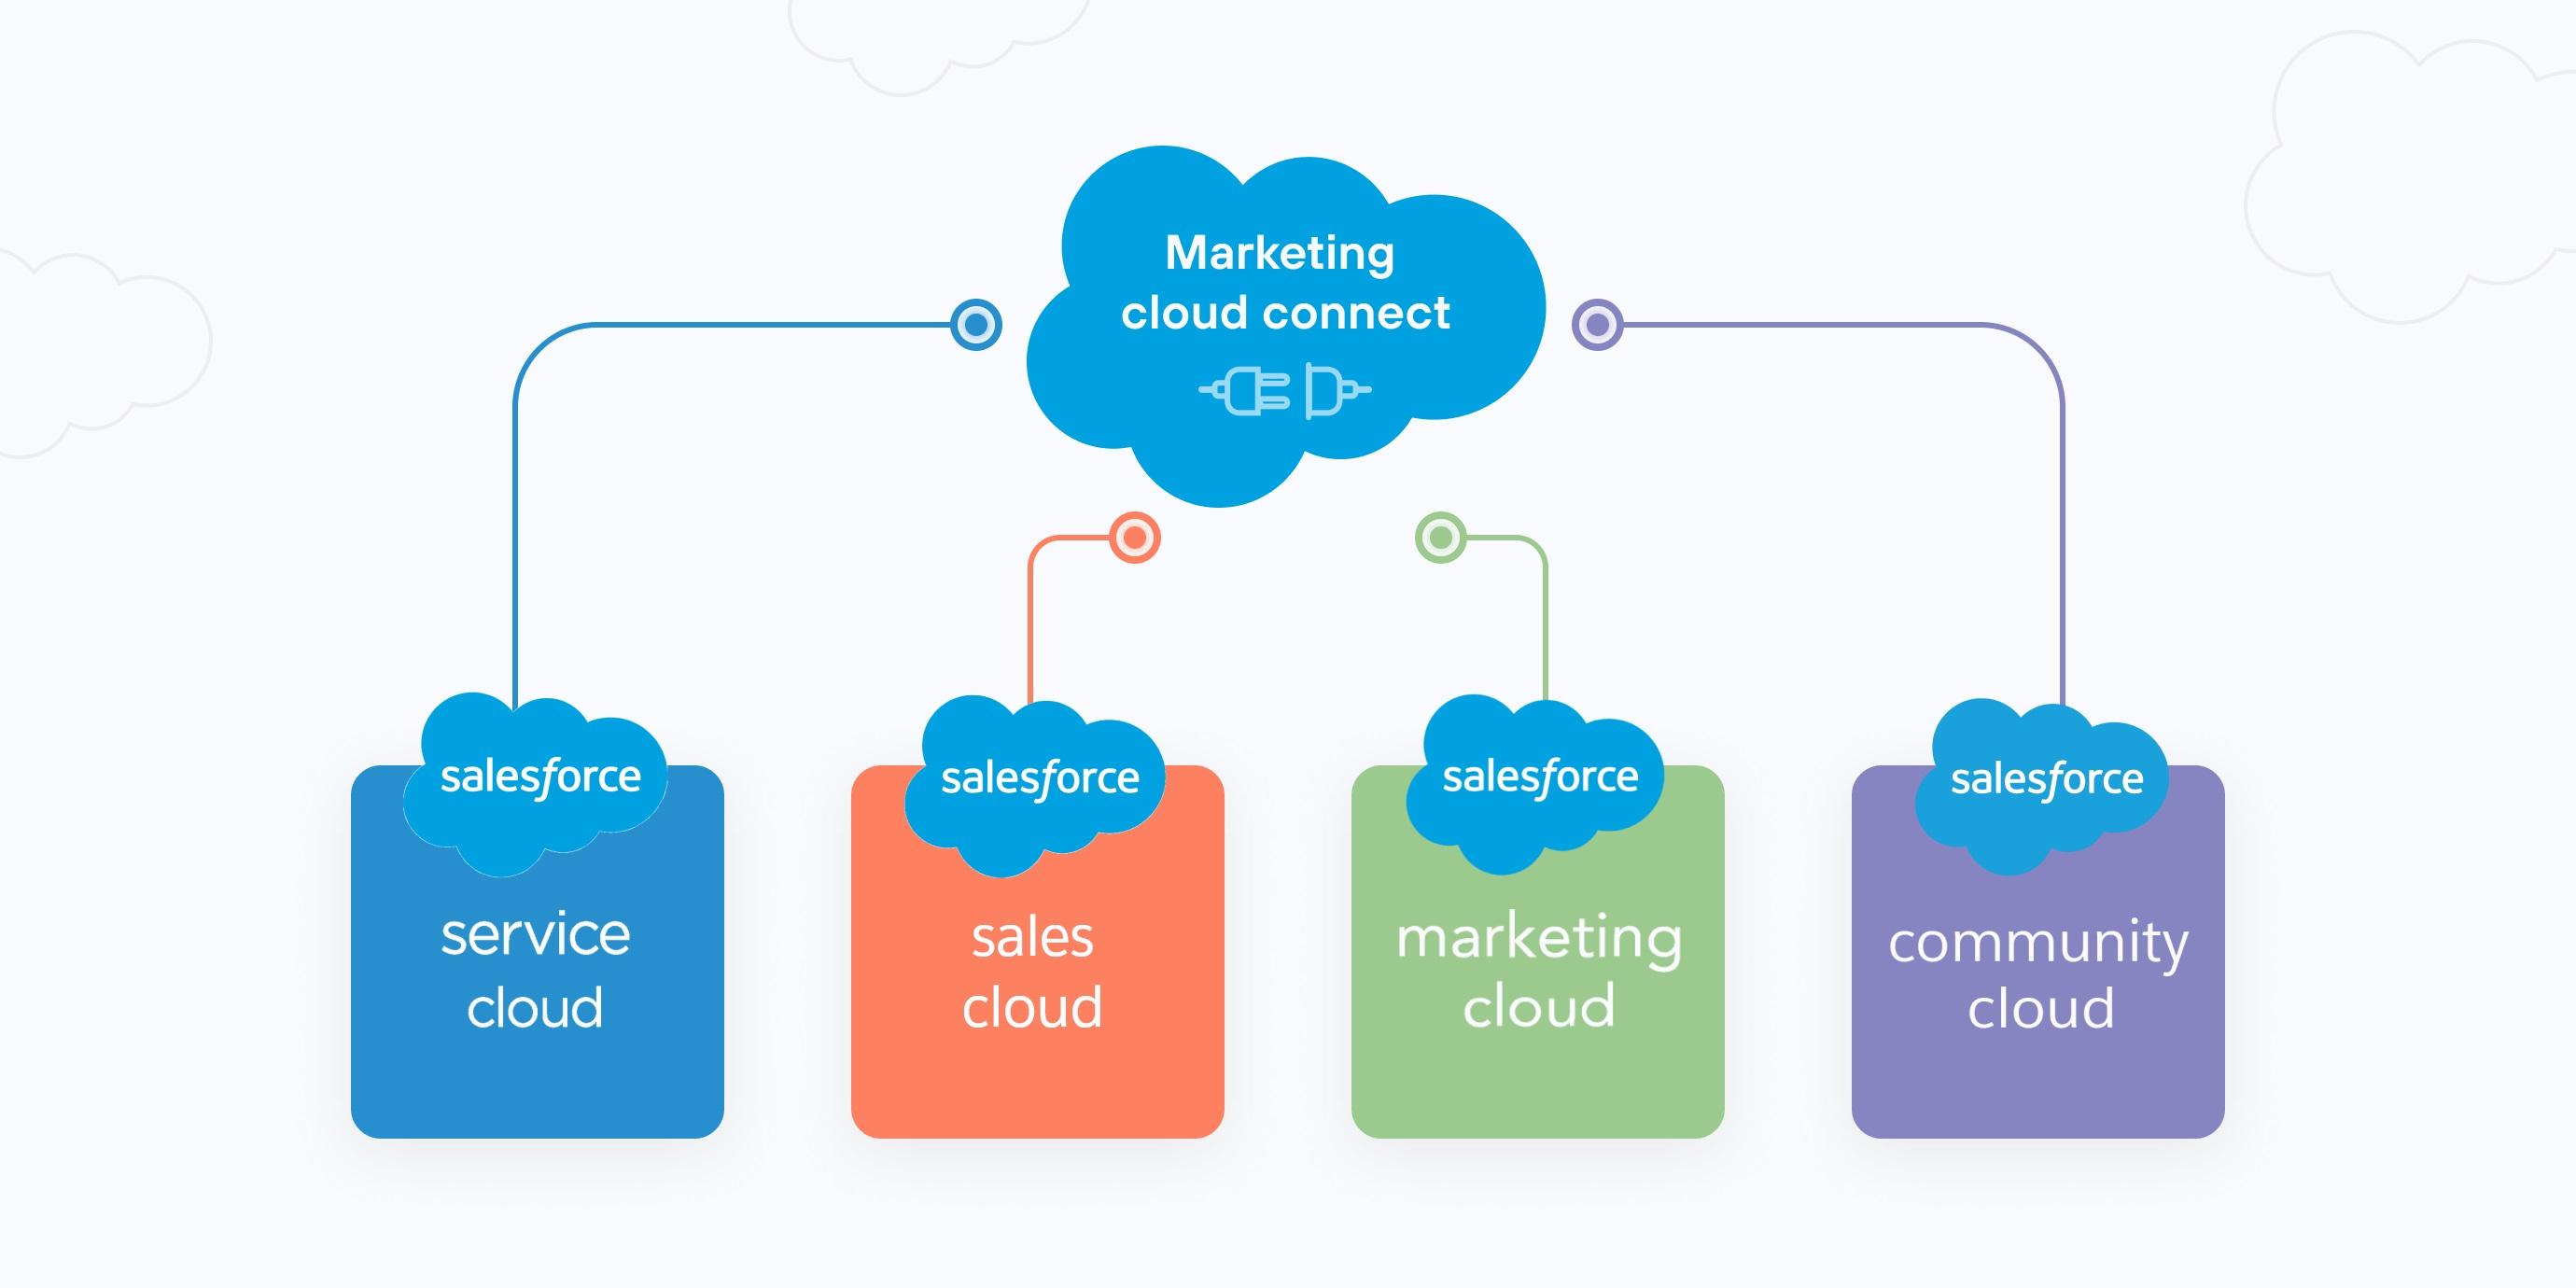 Marketing-Cloud-Connect